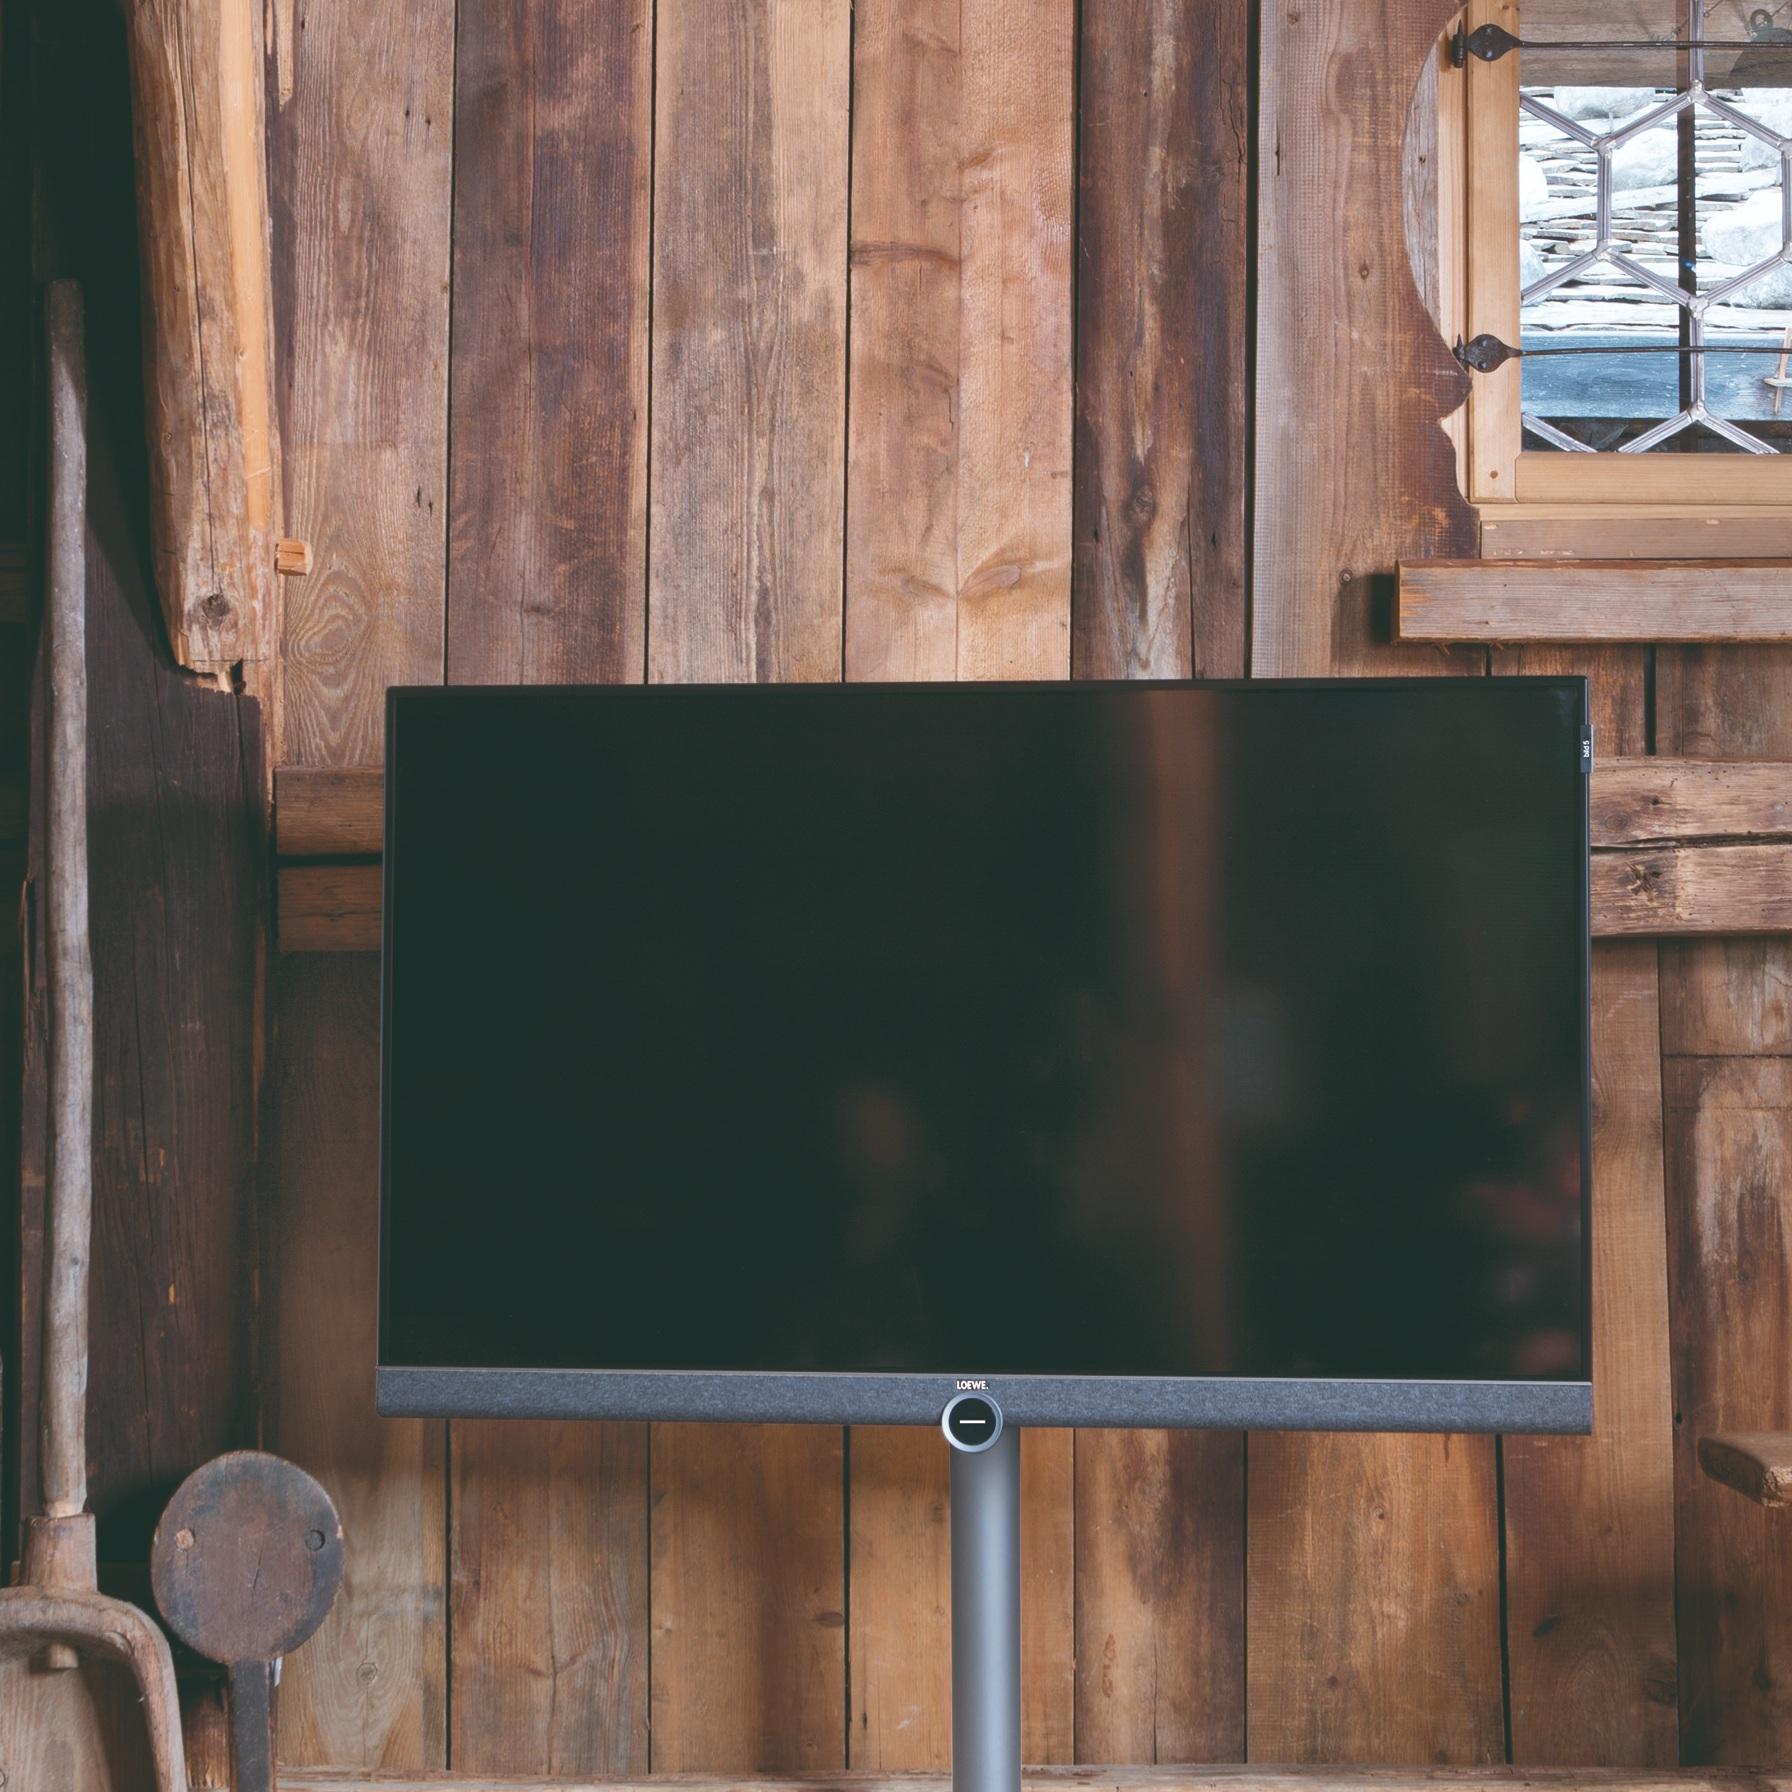 $450 Closed Circuit Security TV Screen -